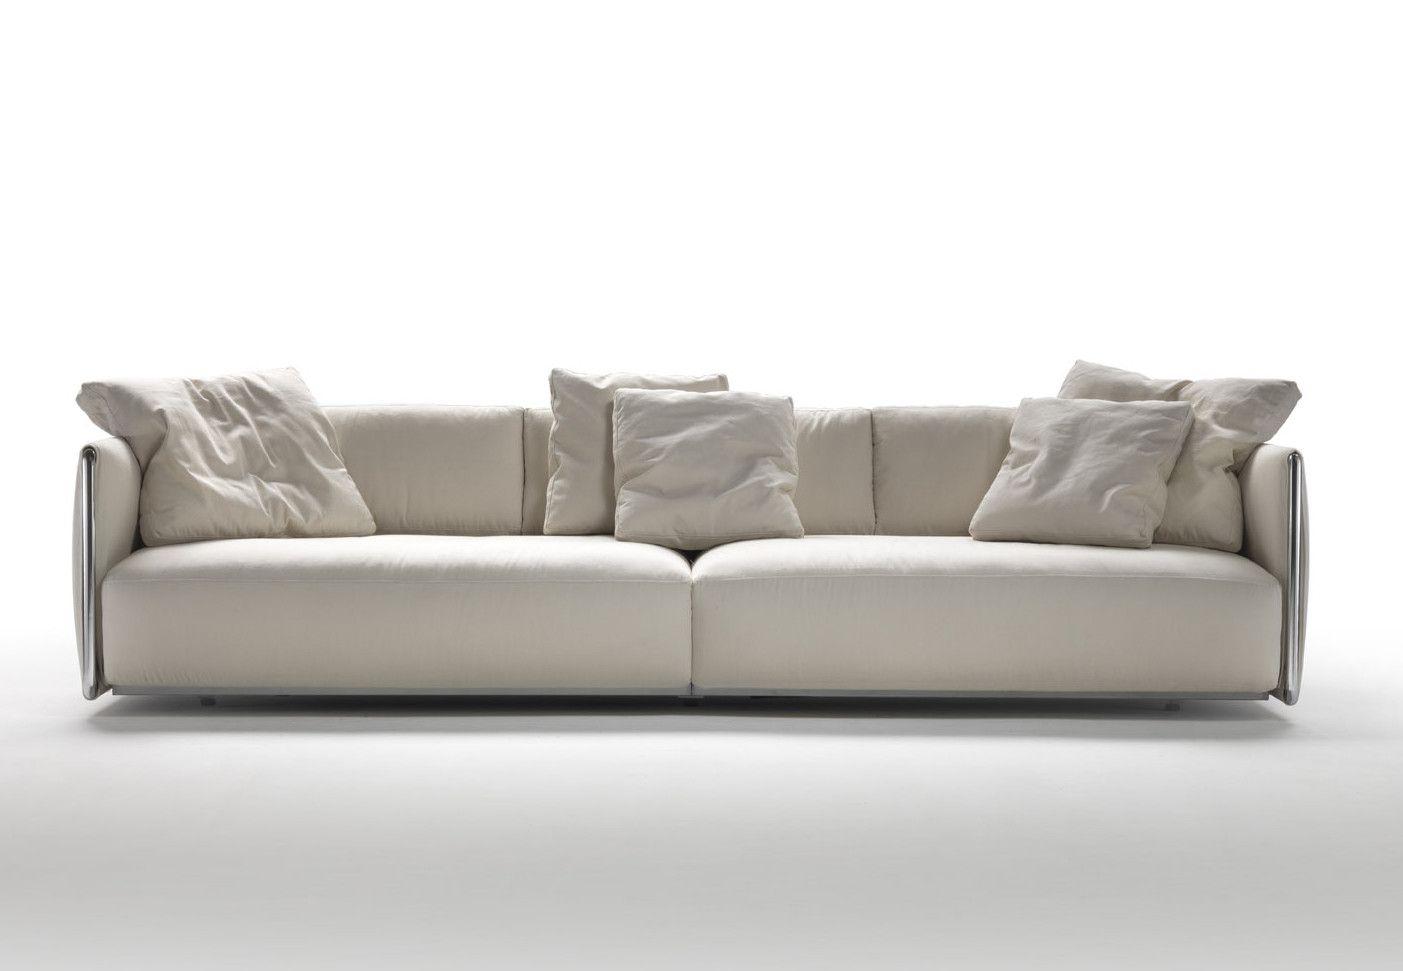 Edmond Products Flexform En Flexform Sofa Sofa Lounge Sofa